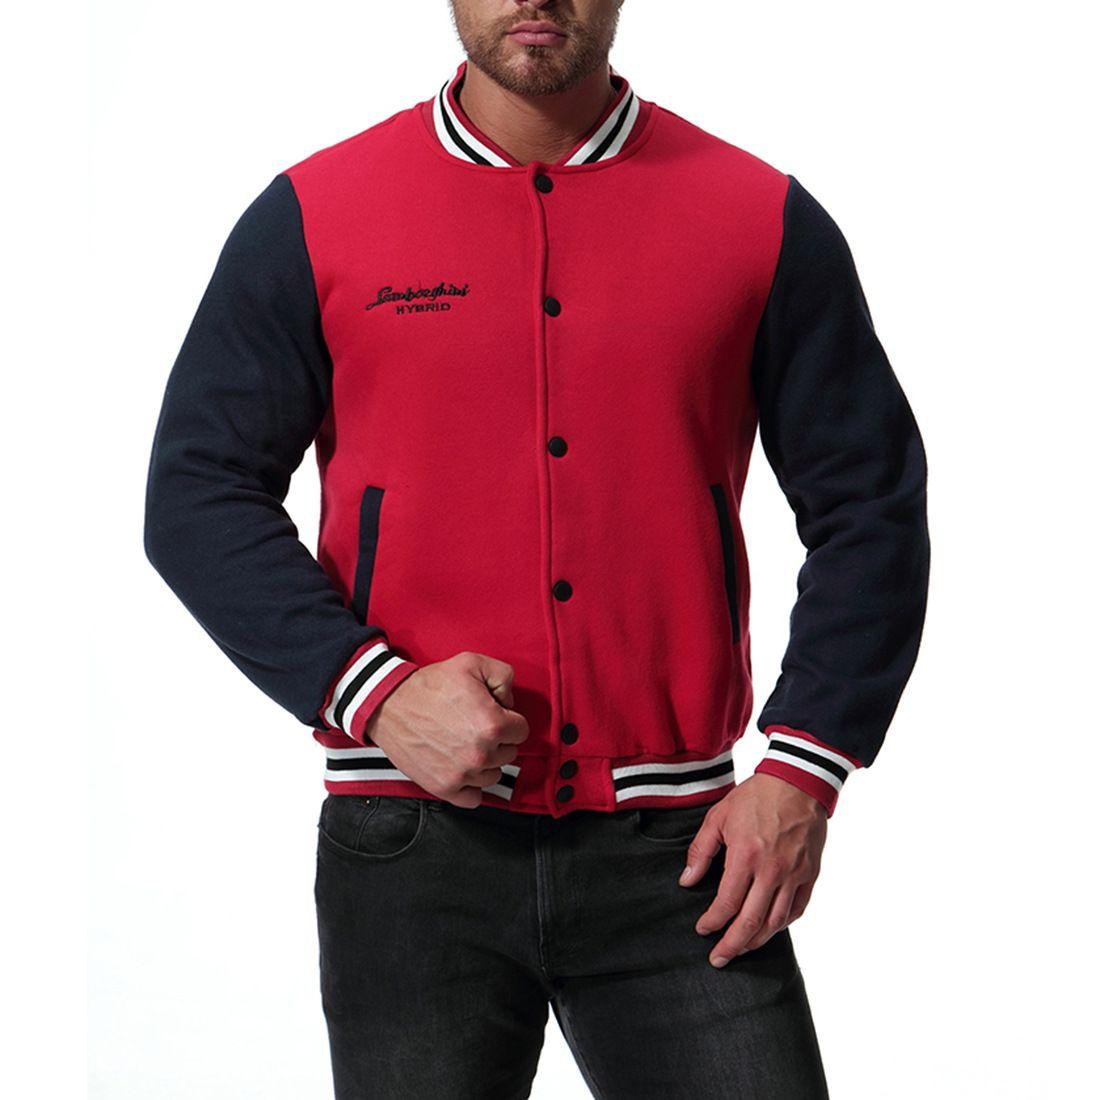 Fleece College Jacket Hommes Vestes Classic Red Mode Varsity Hommes Femmes Automne 2XL Homme J181040 Veste Baseball Mensball Mens Bomber NQSKP